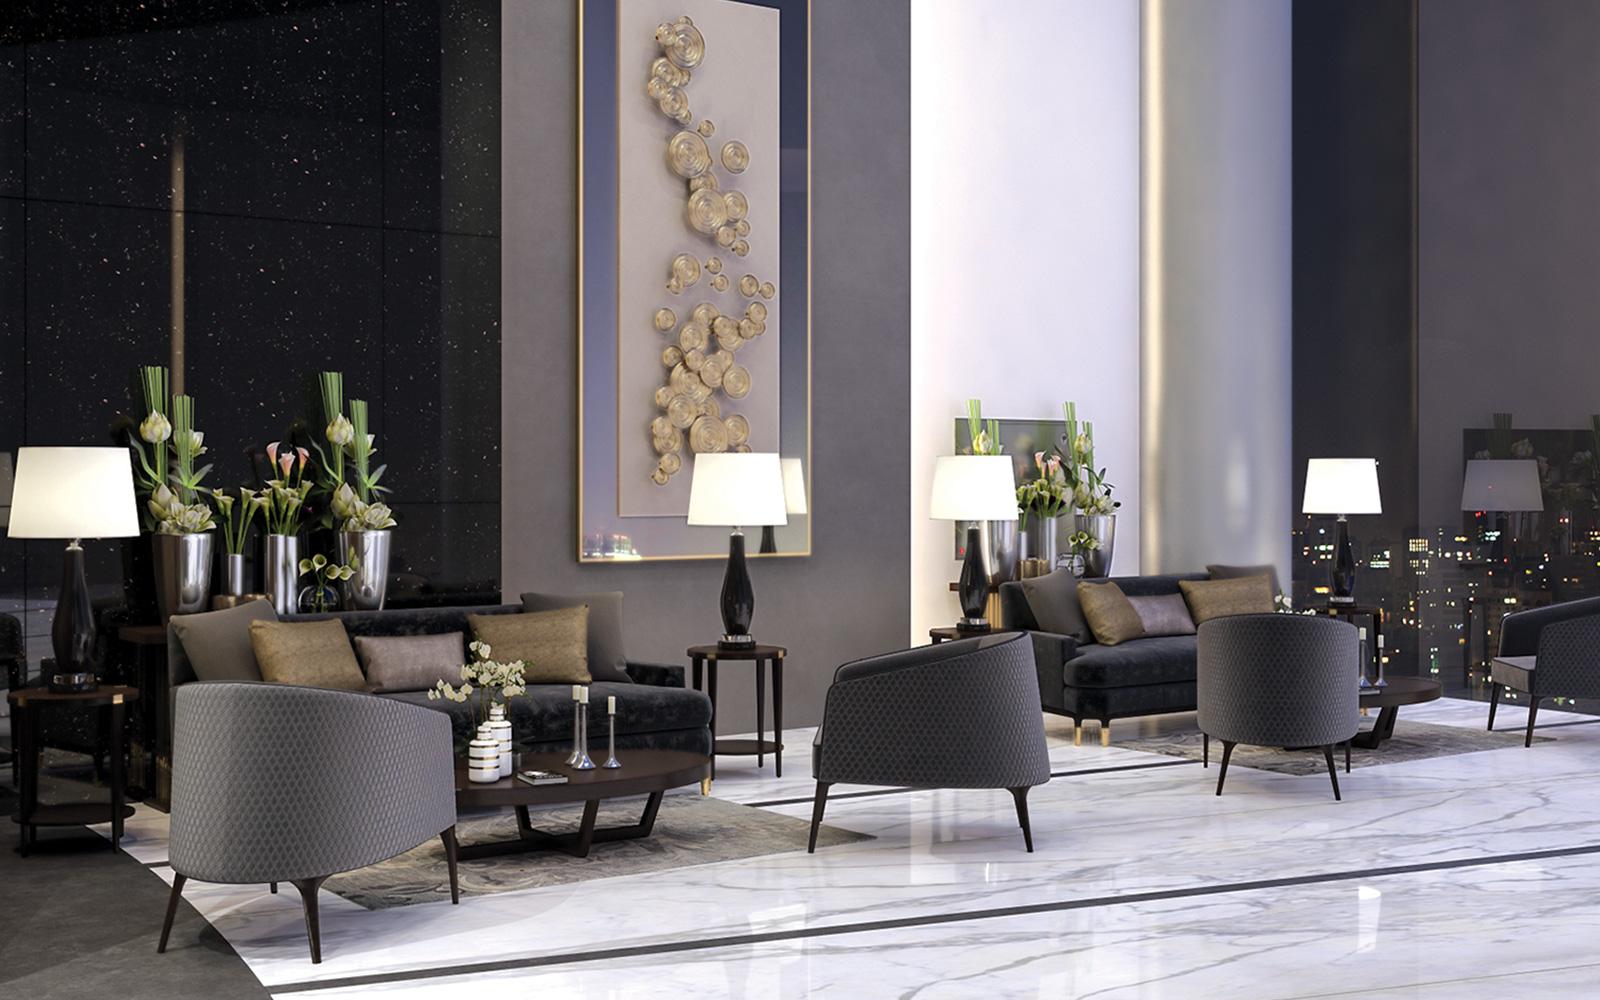 Vogue Design - Saudi Arabia Beyat Plaza8